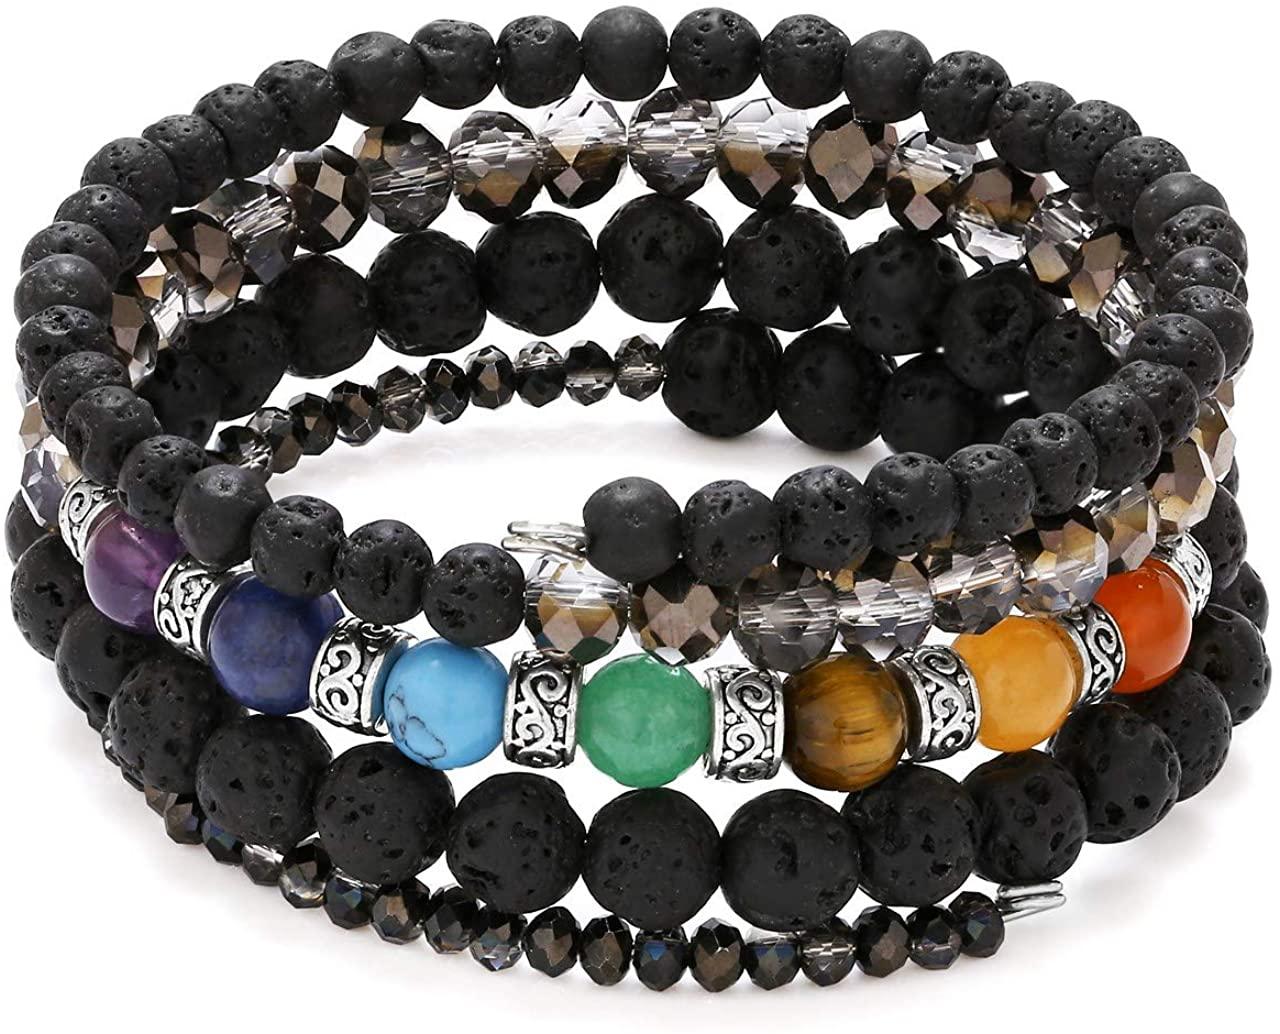 Top Plaza 7 Chakra Yoga Meditation Healing Crystal Beads Bracelet Multilayer Wrap Bracelets Bangle Reiki Quartz Jewelry for Womens